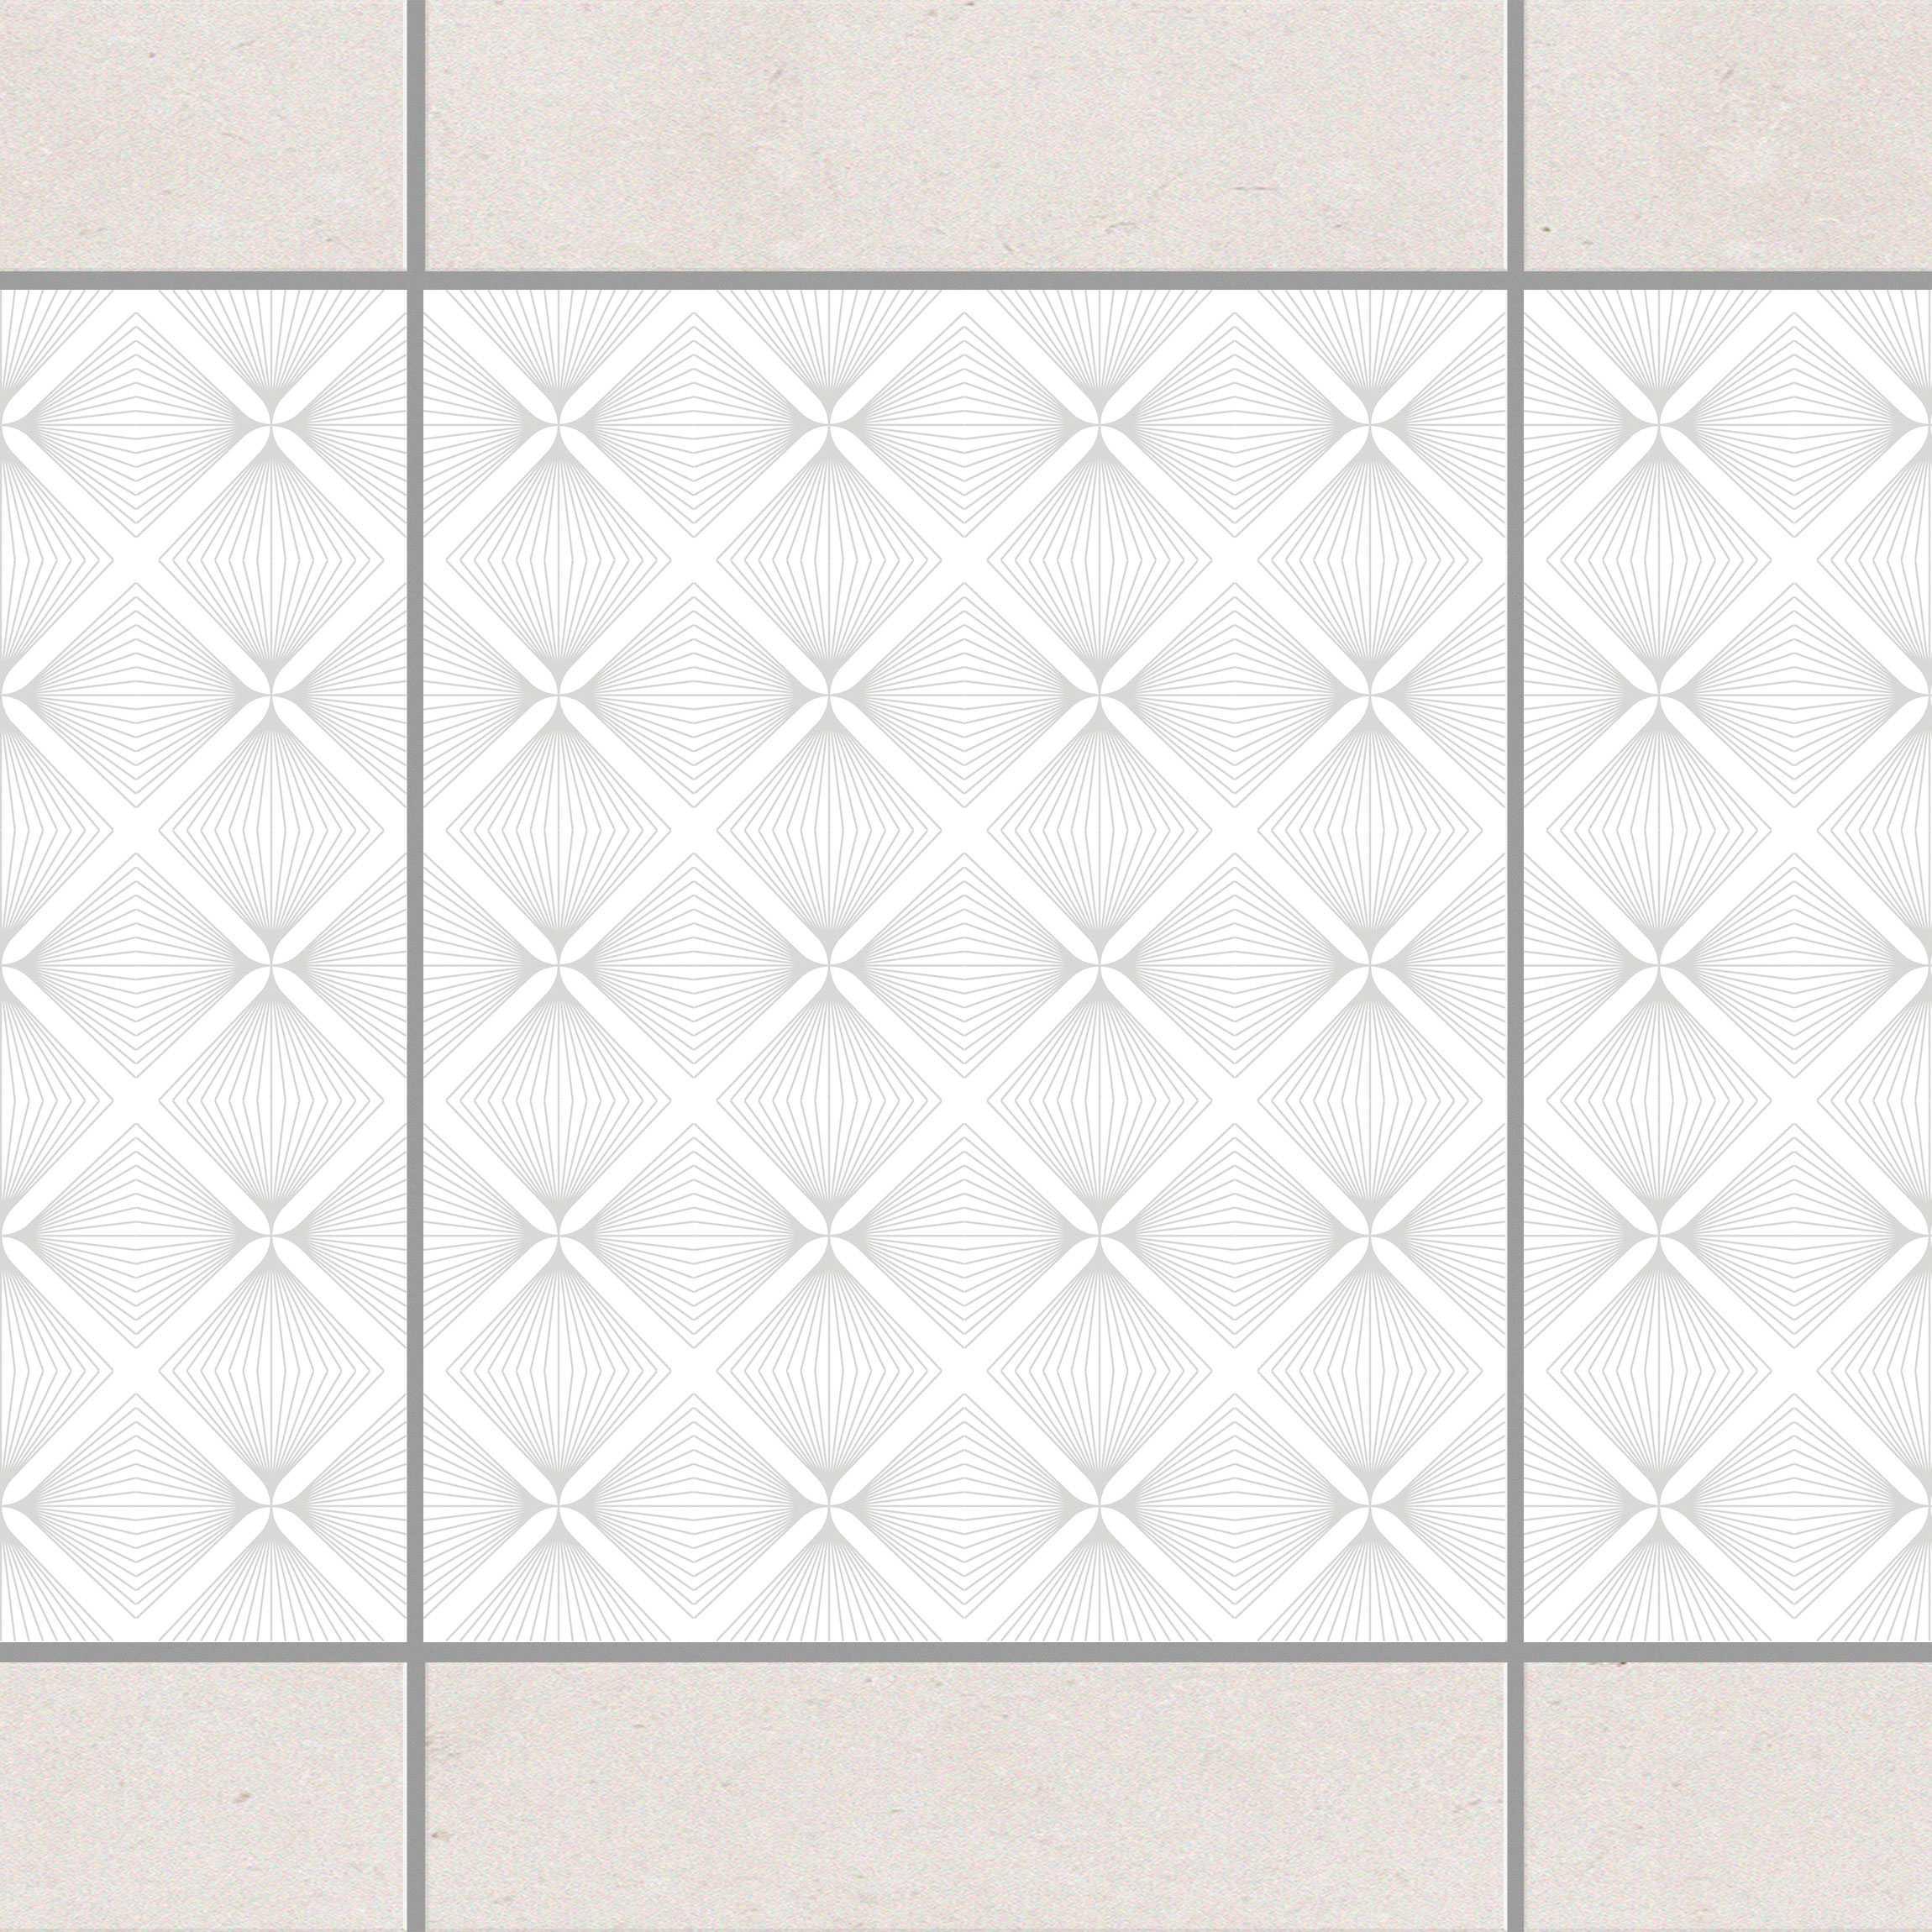 fliesen bord re zartes vintage caro white light grey 25x20 cm fliesenaufkleber grau. Black Bedroom Furniture Sets. Home Design Ideas